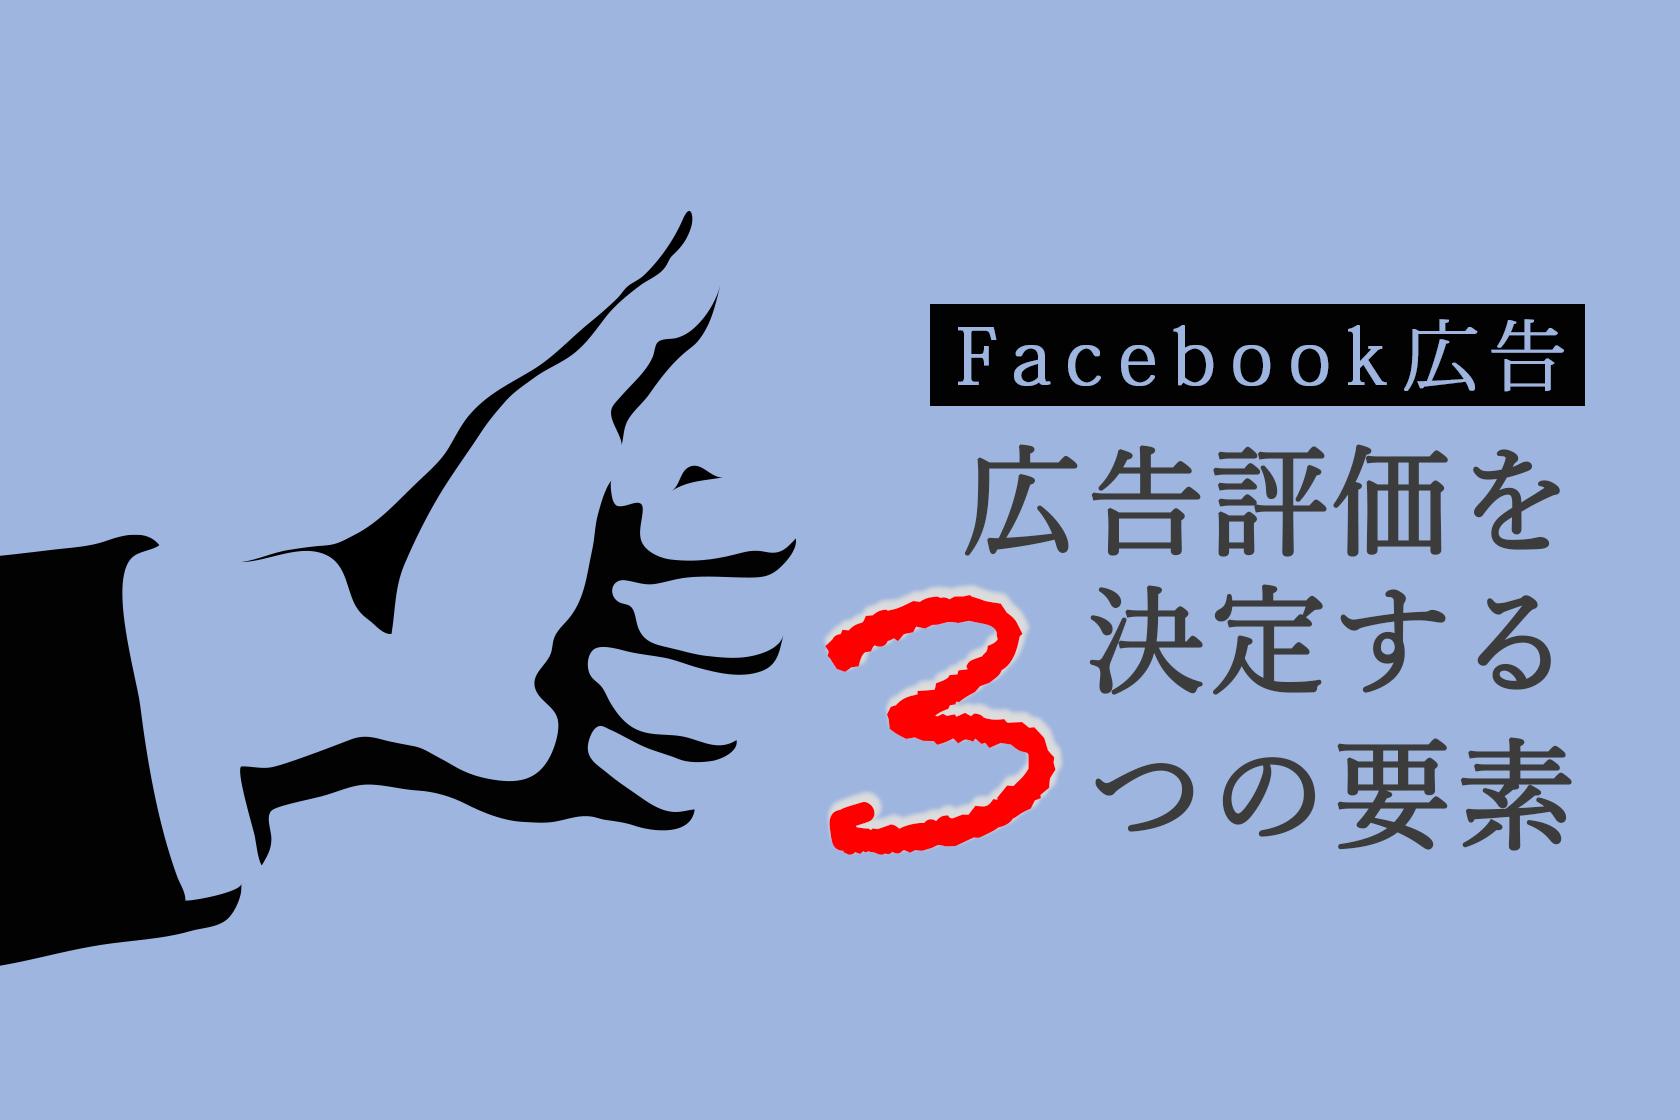 Facebook広告 広告評価を決定する3つの要素